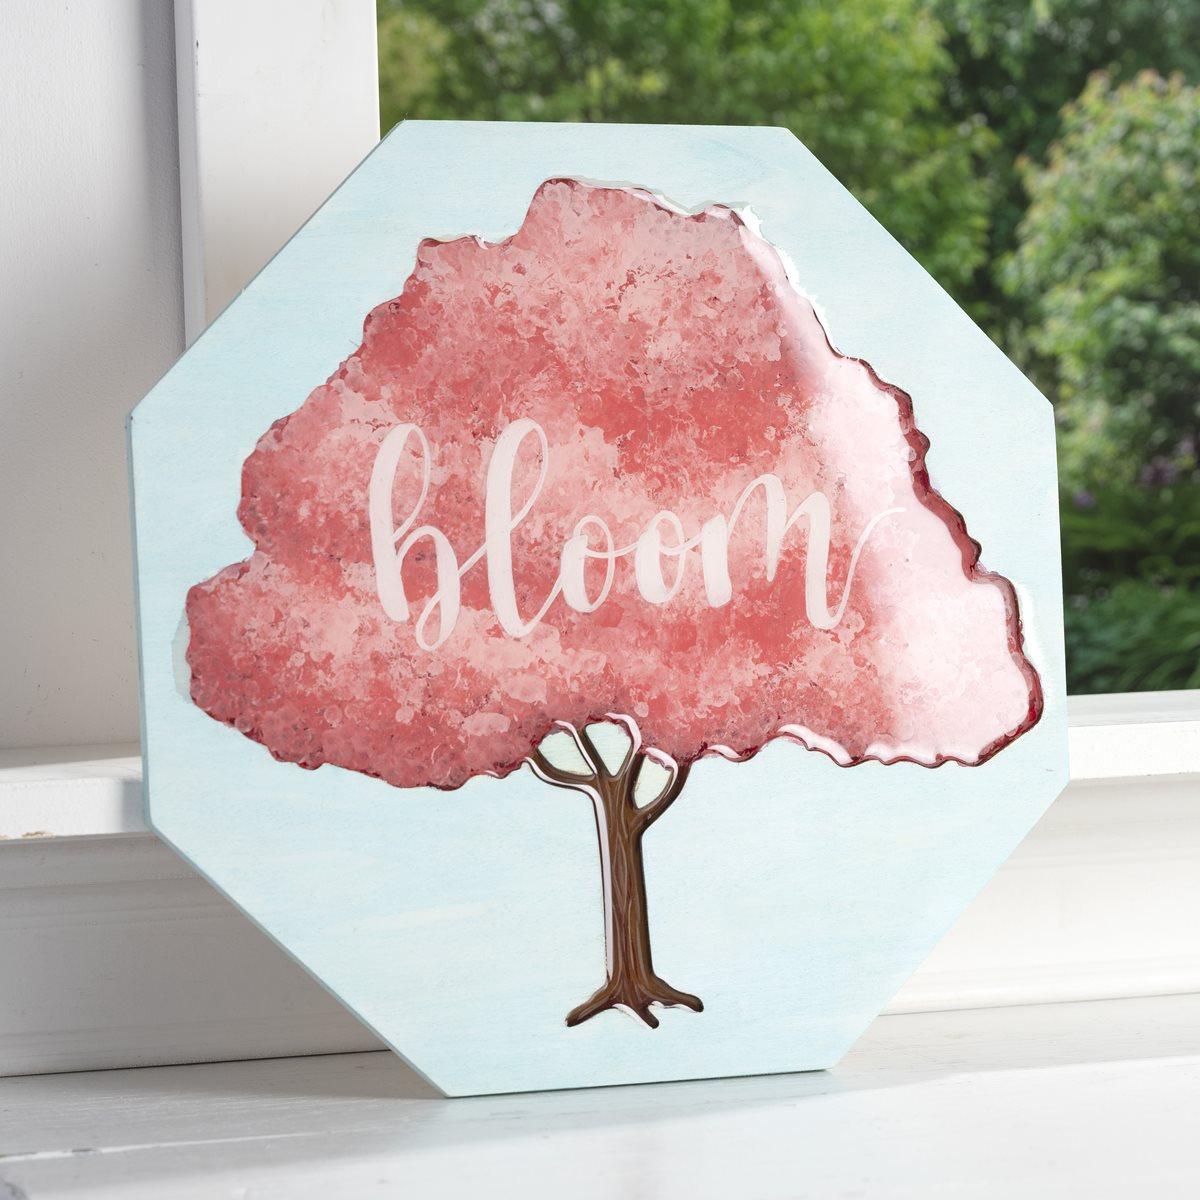 Bloom Cherry Blossom Tree